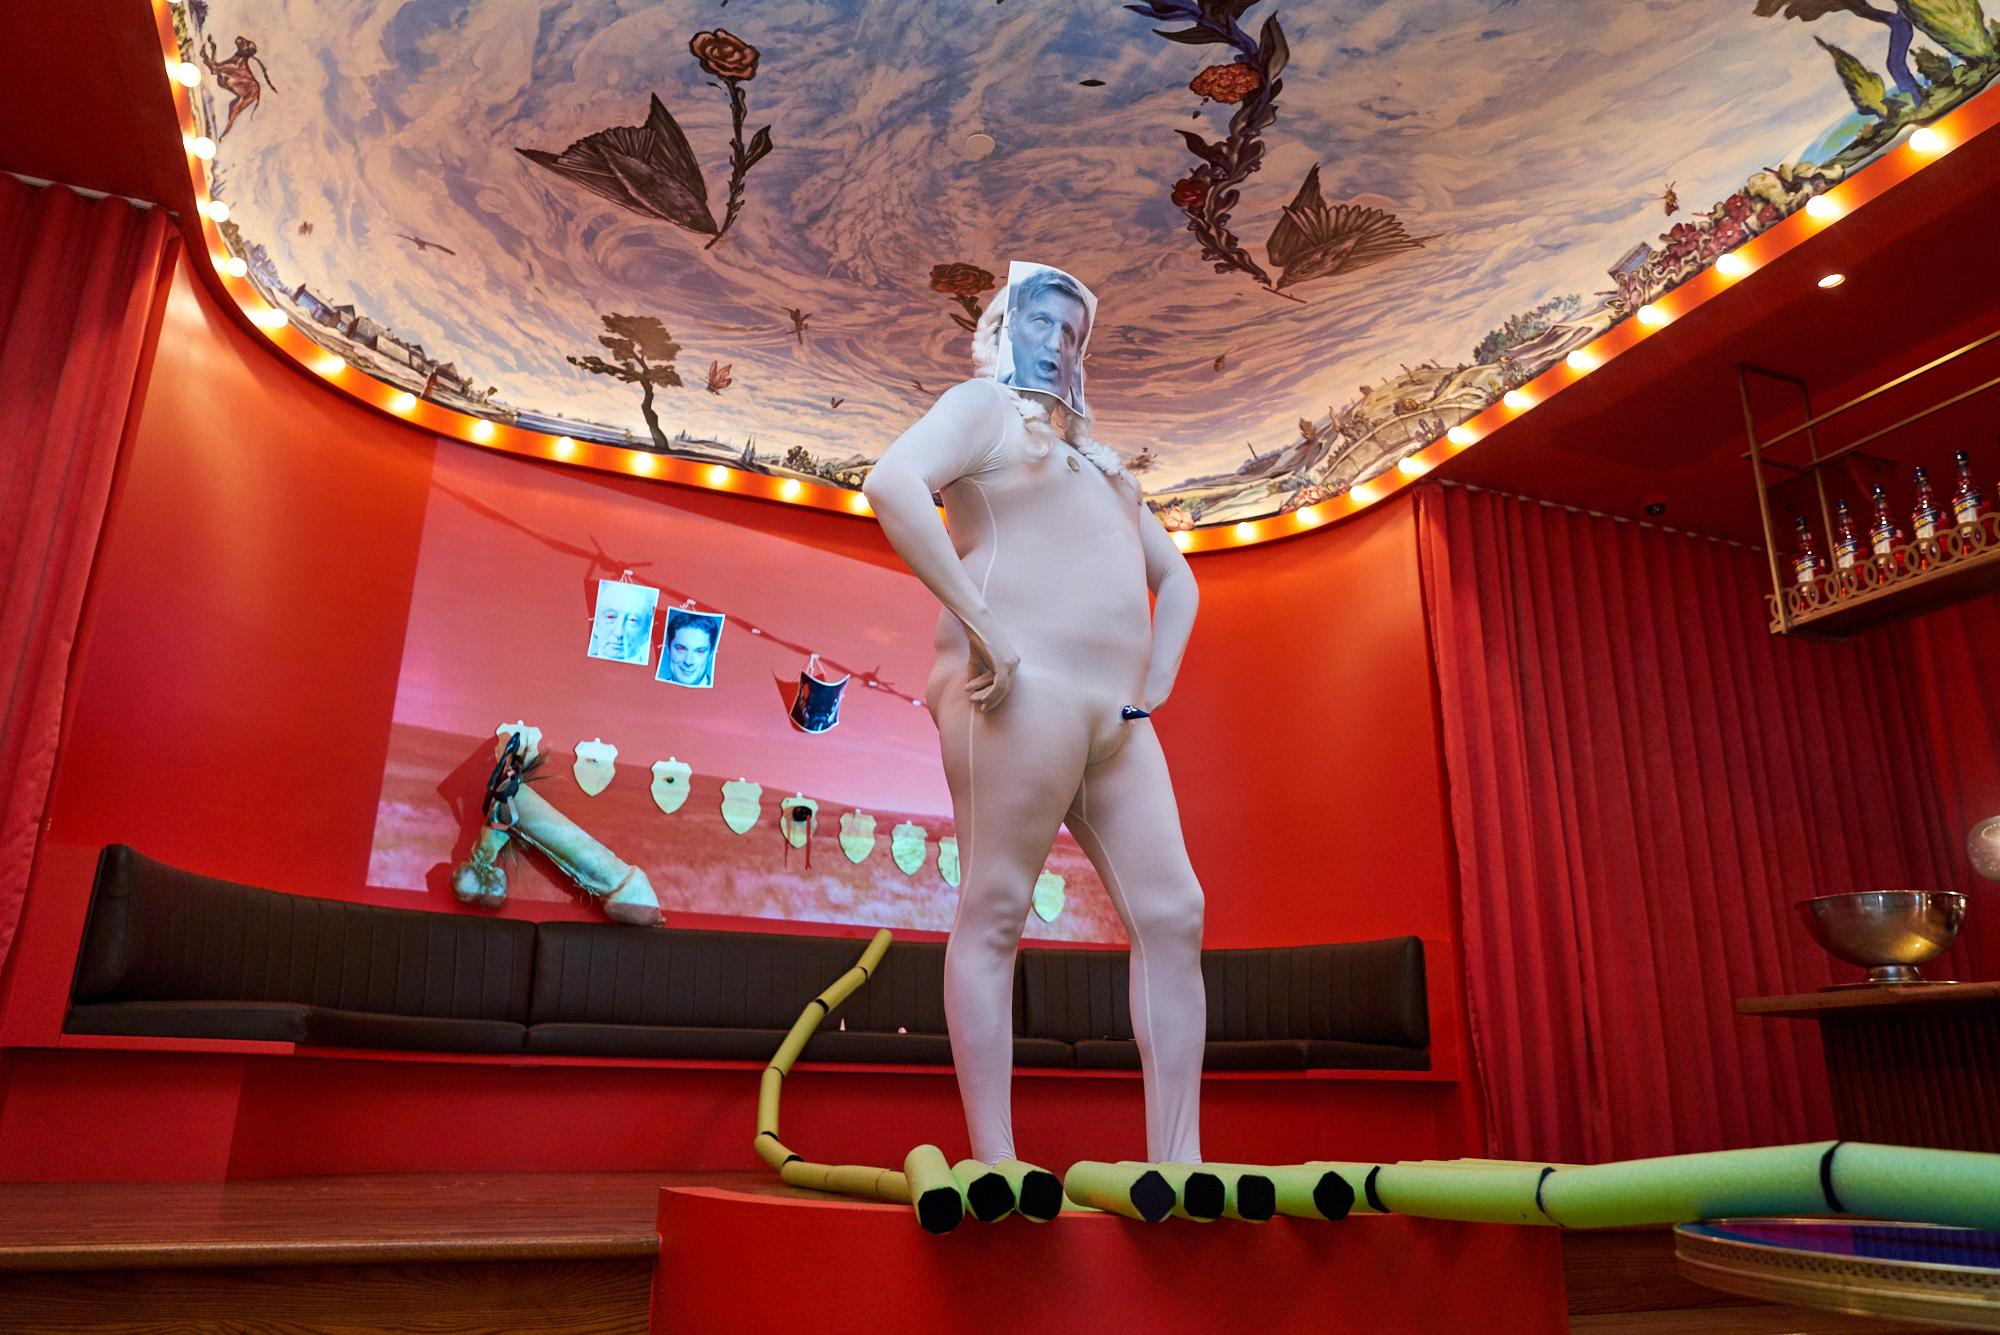 Adrian Stimson. Naked Napi Big Game Hunter, 2019. Performance au Cabaret Vol de nuit, 14 rue Prince-Arthur Est, Montréal. Photo : Betty Bogaert